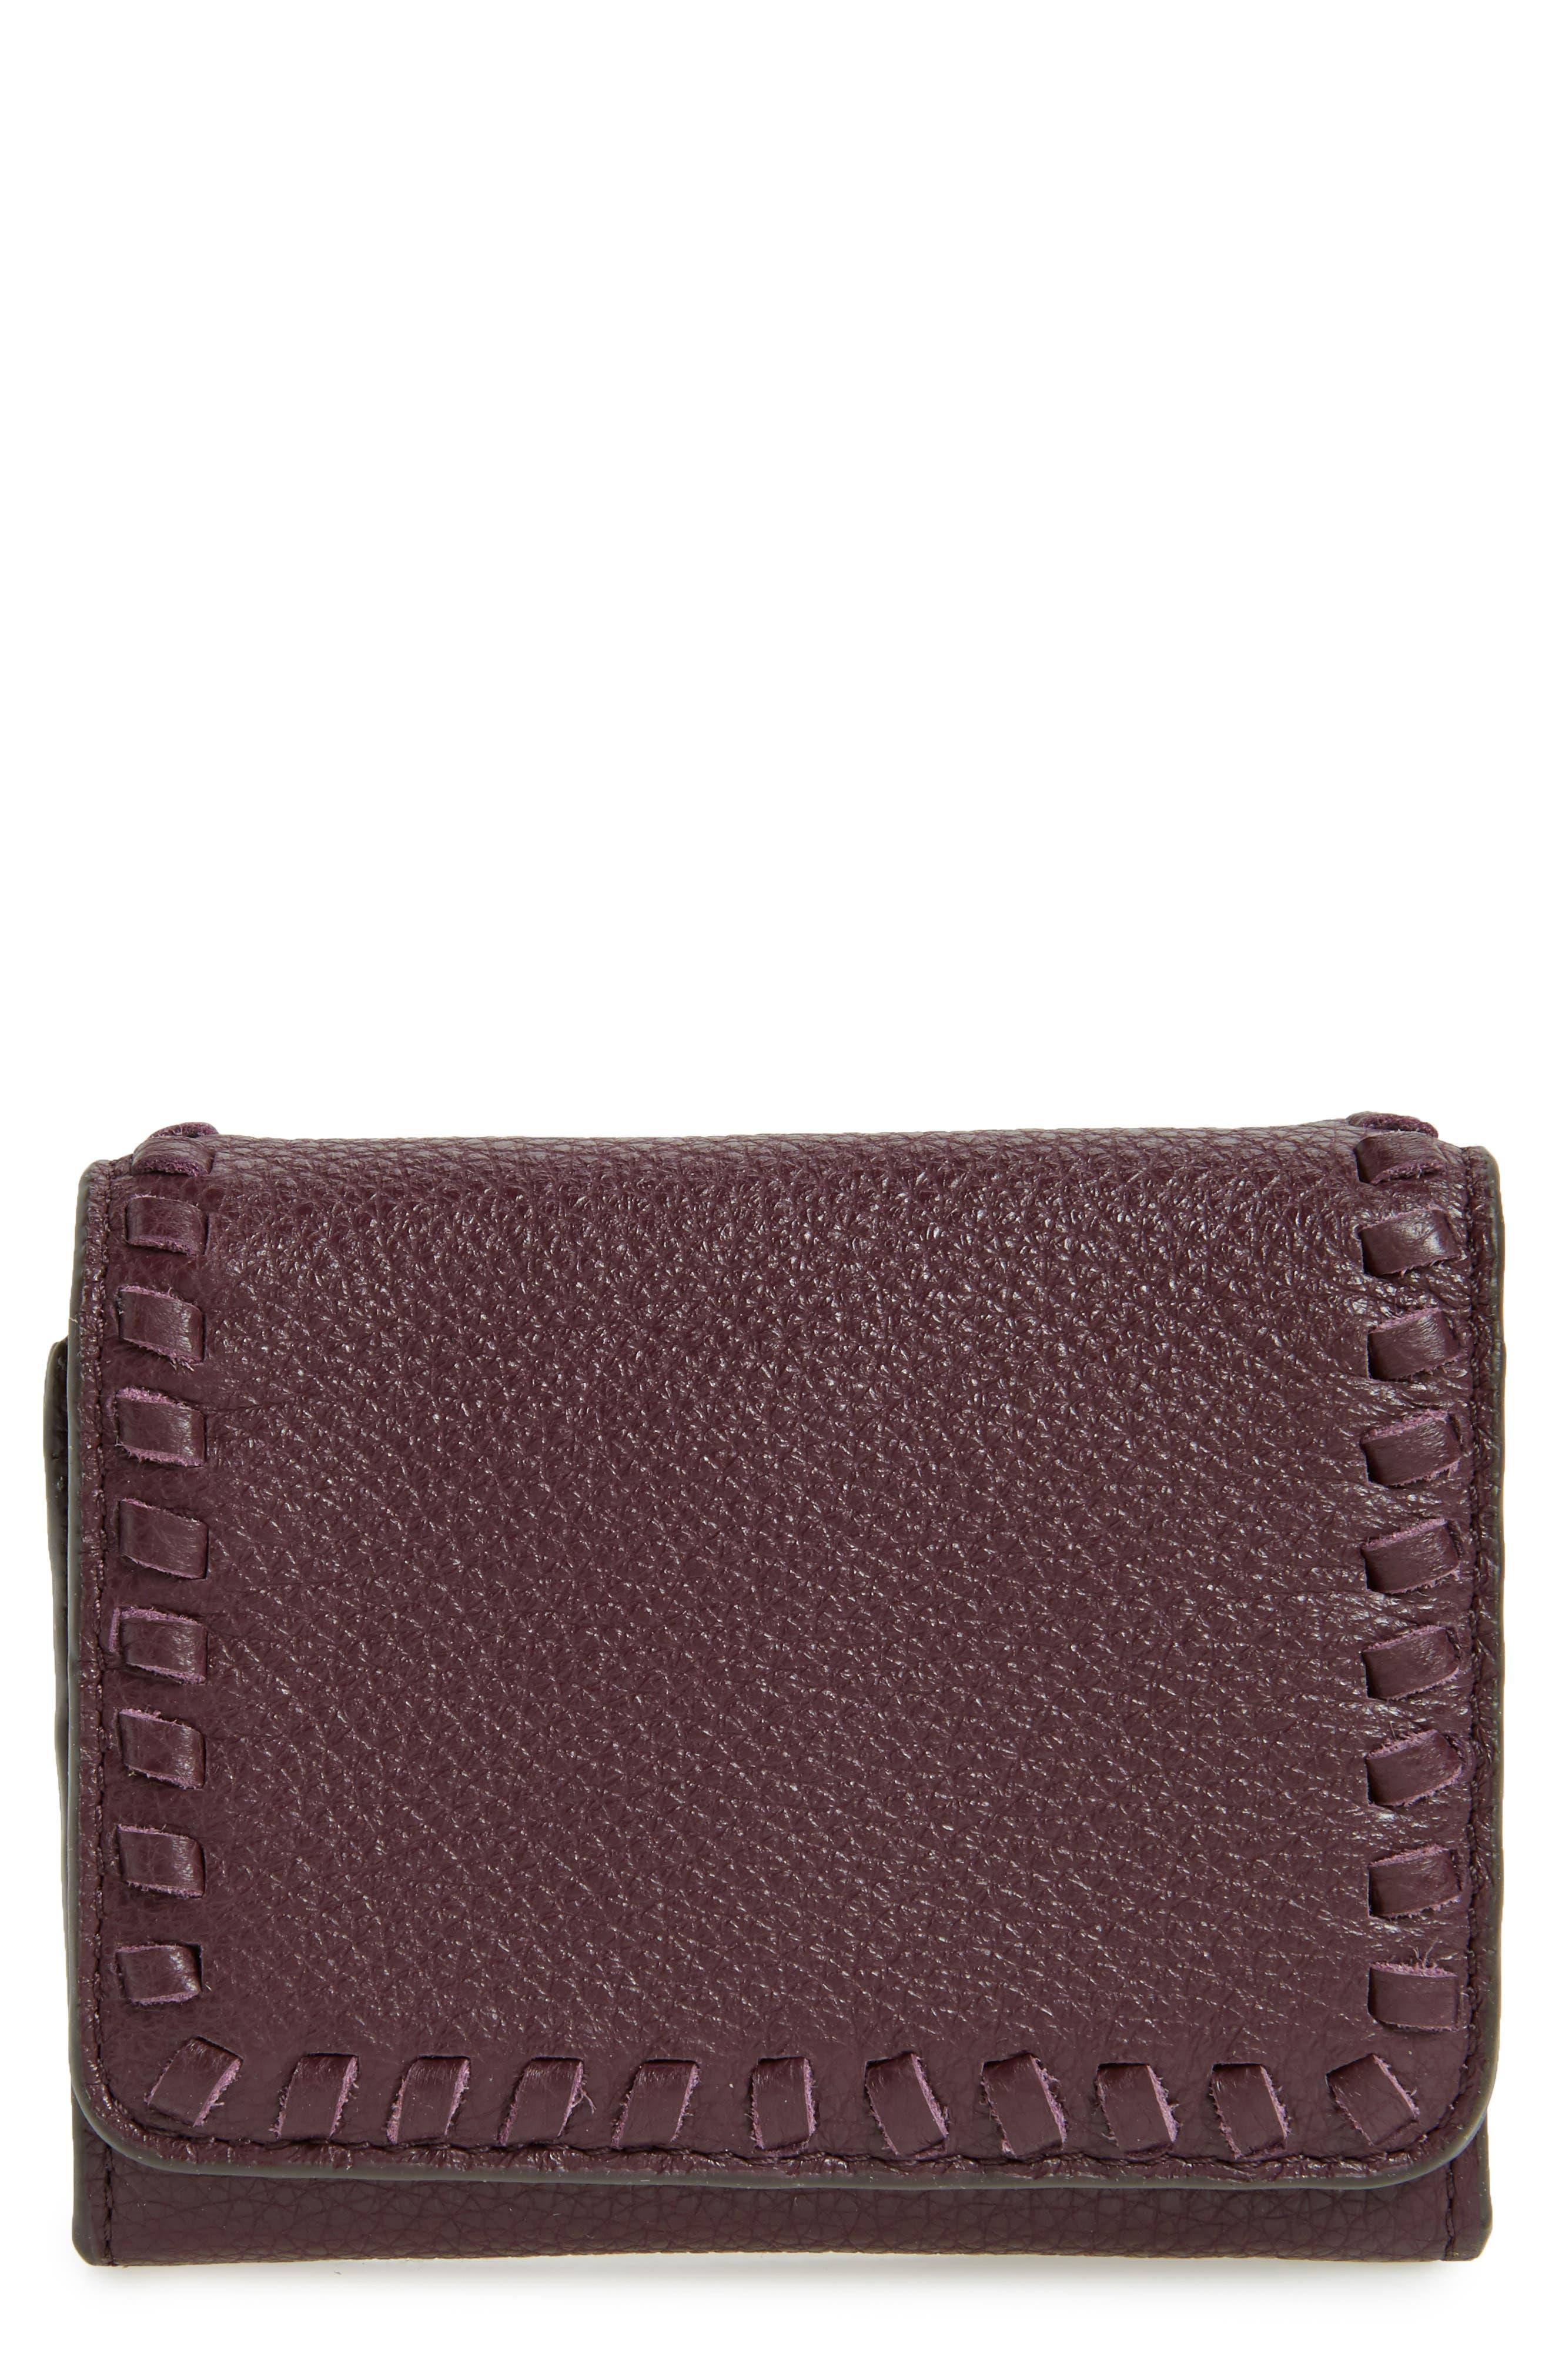 Main Image - Rebecca Minkoff Mini Vanity Leather Wallet